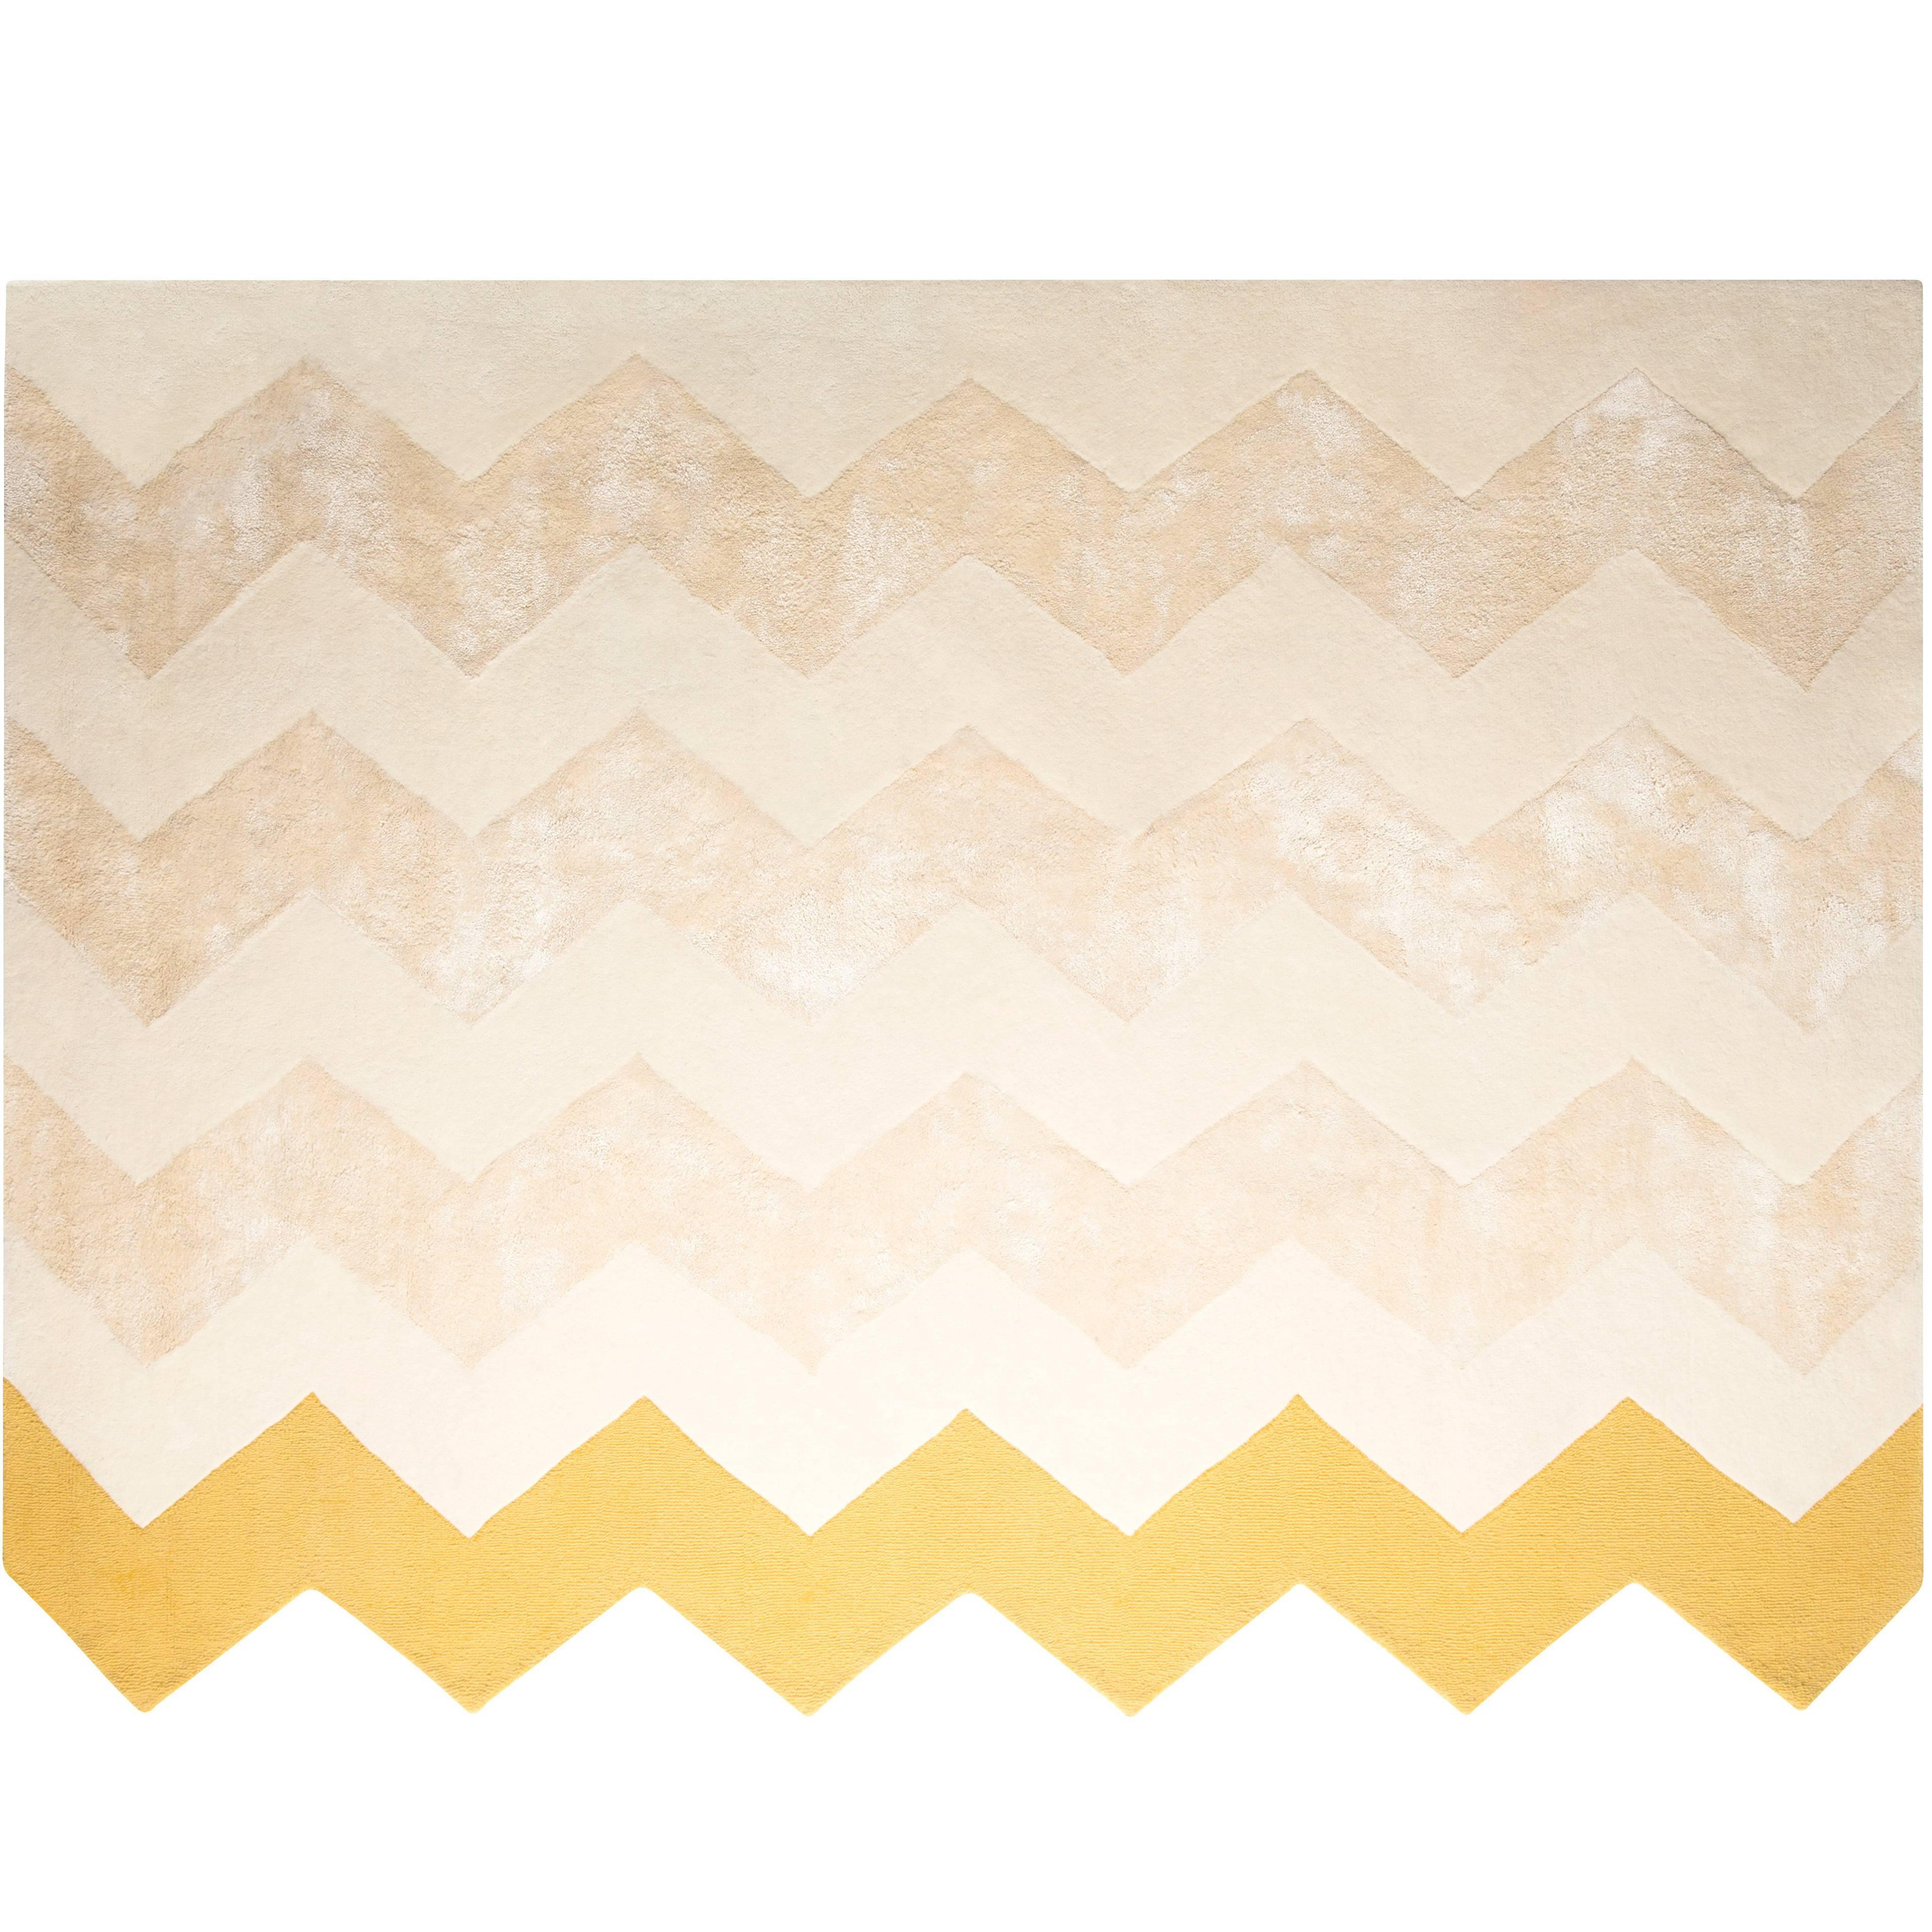 Zuko Chevron Print Rug by Pieces, Modern Grey Hand Tufted Zig Zag Rug Carpet